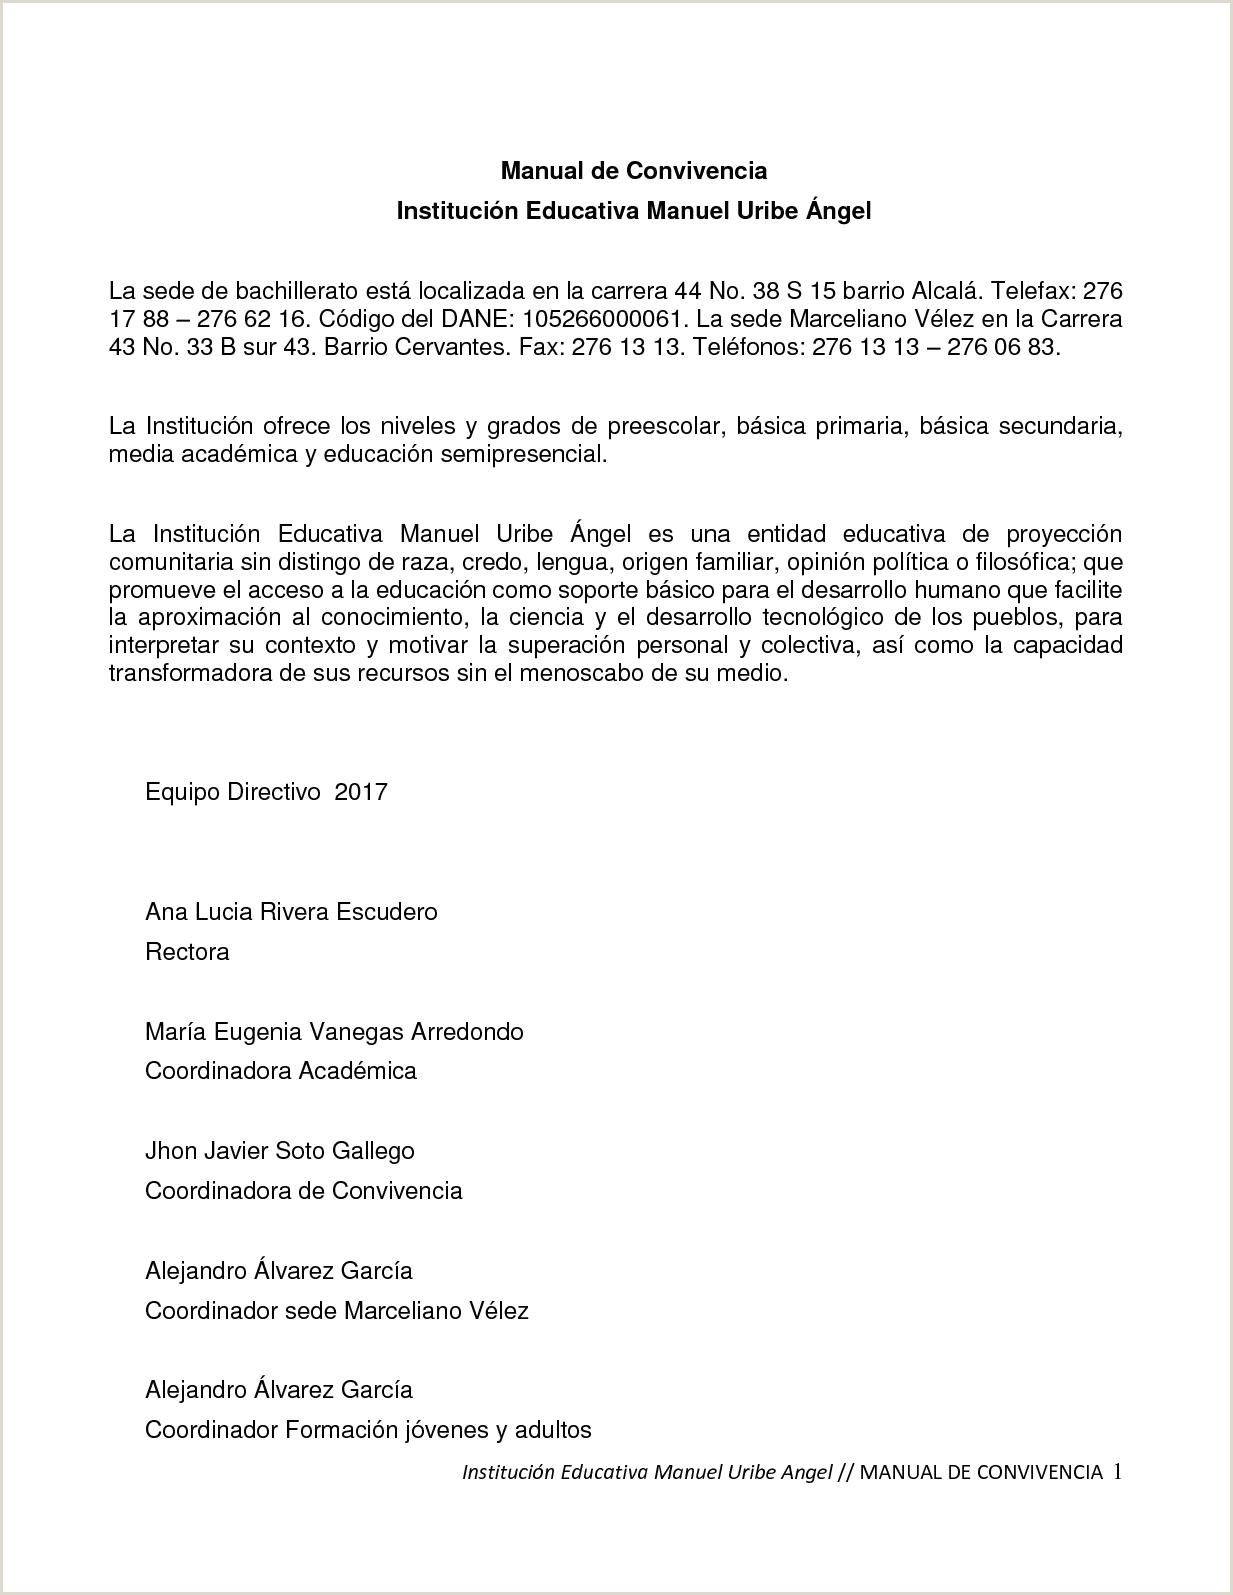 Formato Unico Hoja De Vida Gobernacion De Antioquia Calaméo Manual De Convivencia Mua 2017